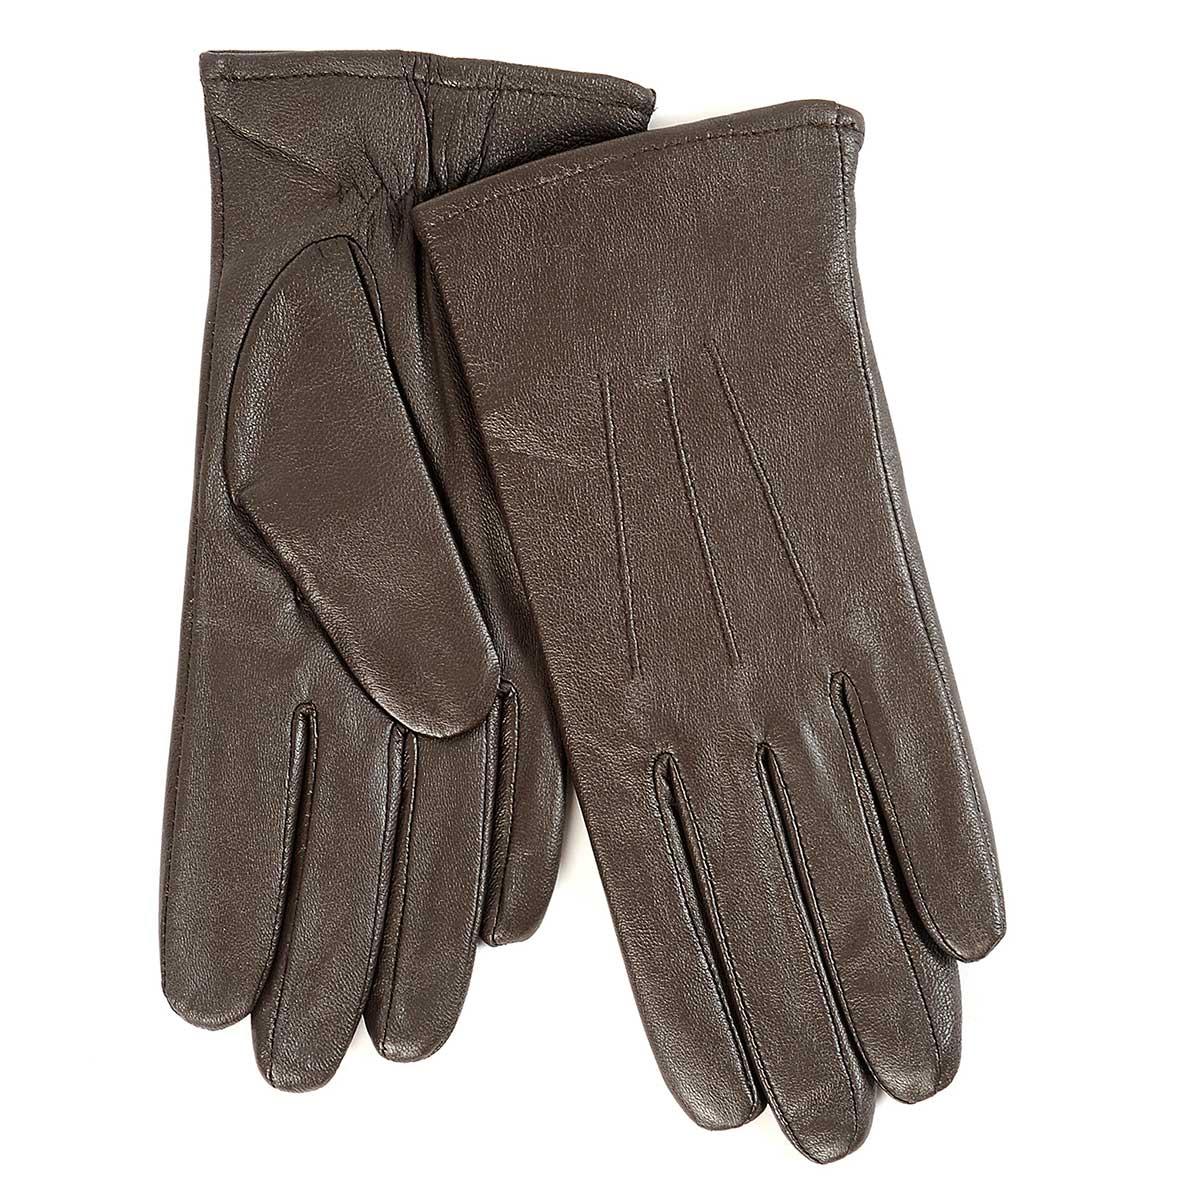 Ladies leather gloves isotoner - Isotoner Ladies 3 Point Waterproof Leather Glove Chocolate